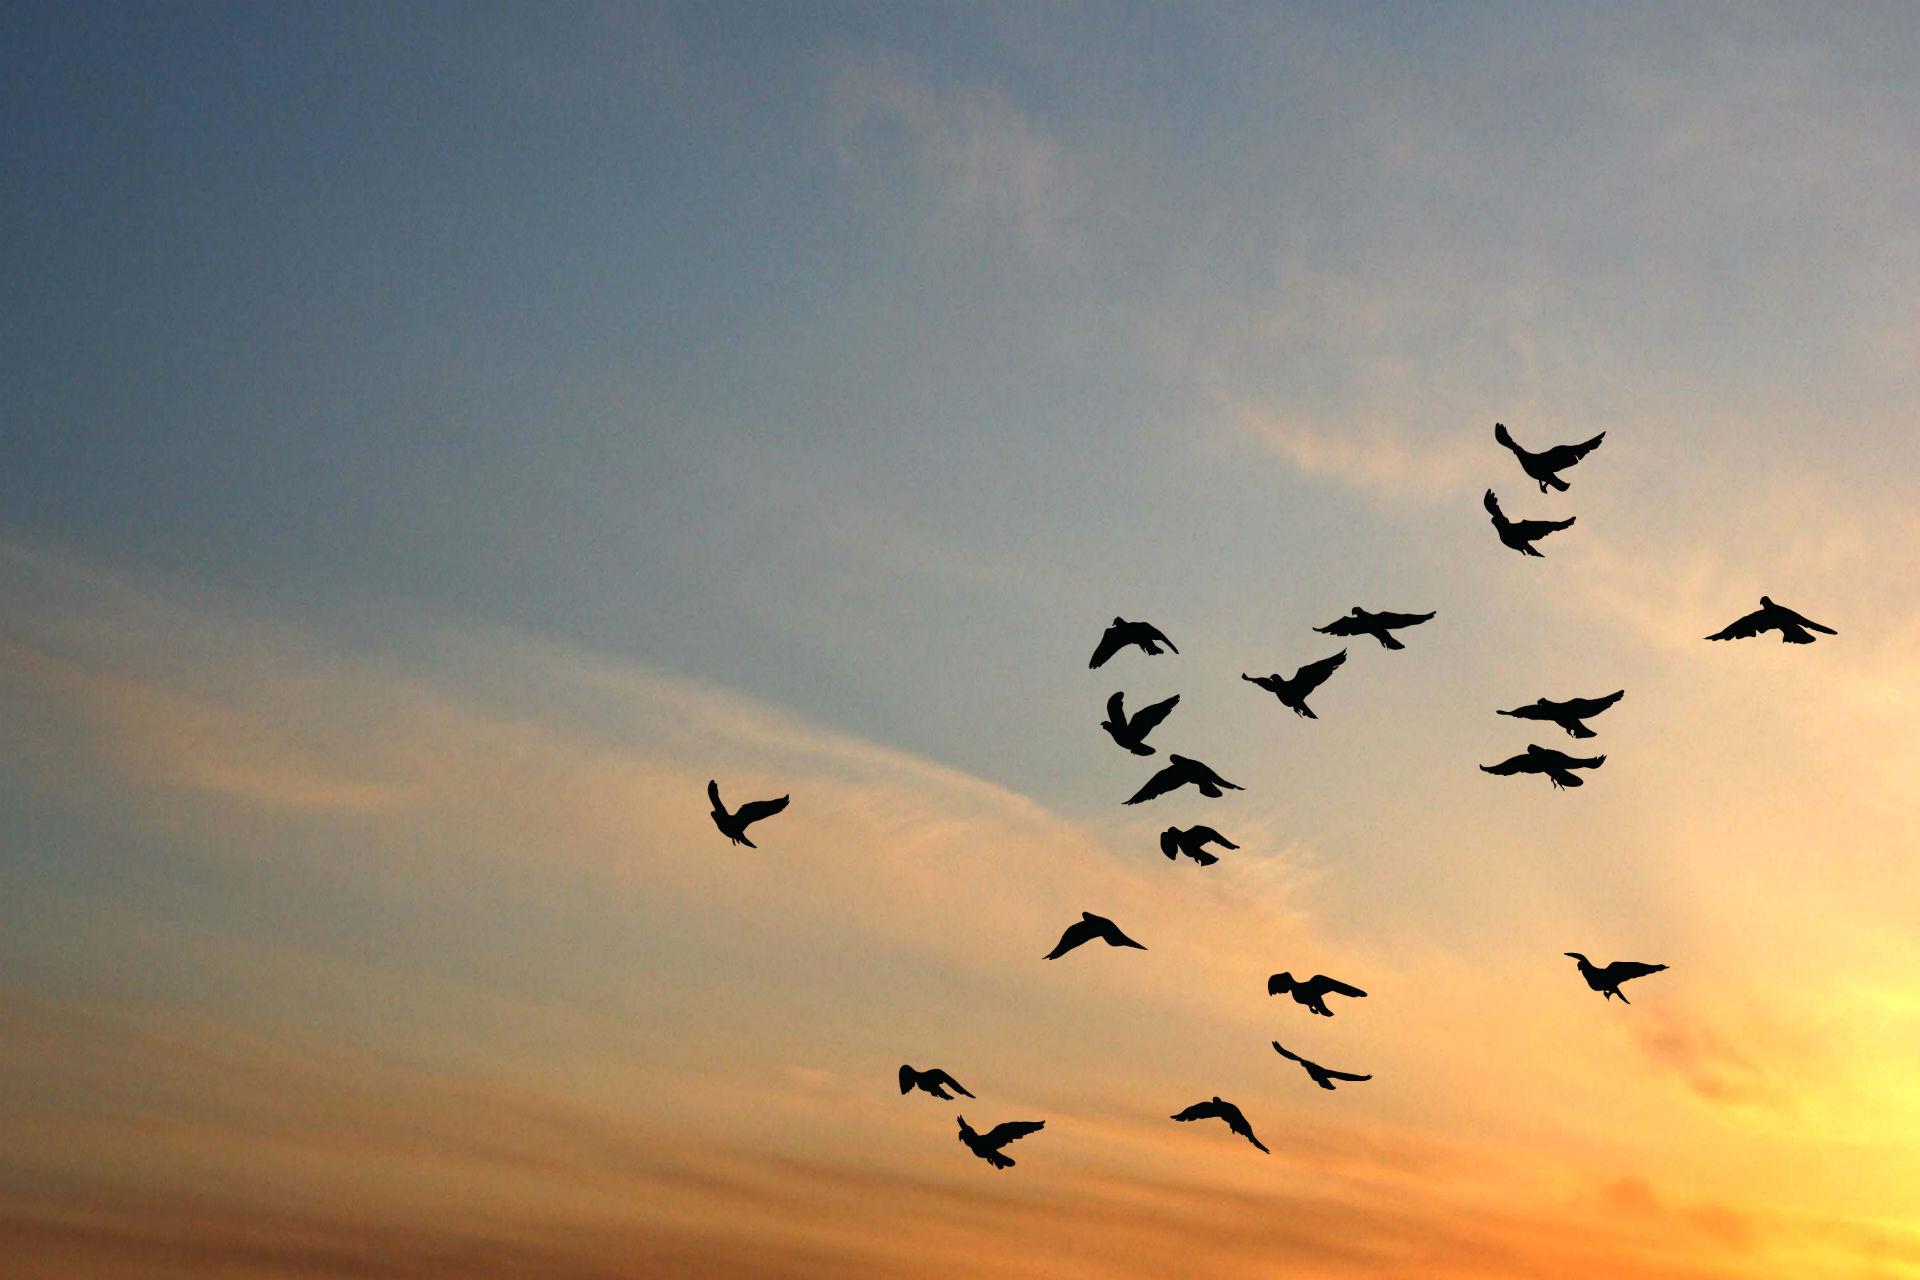 Pigeons Flying Wallpaper Pigeons Sky Flight Flly Sunset